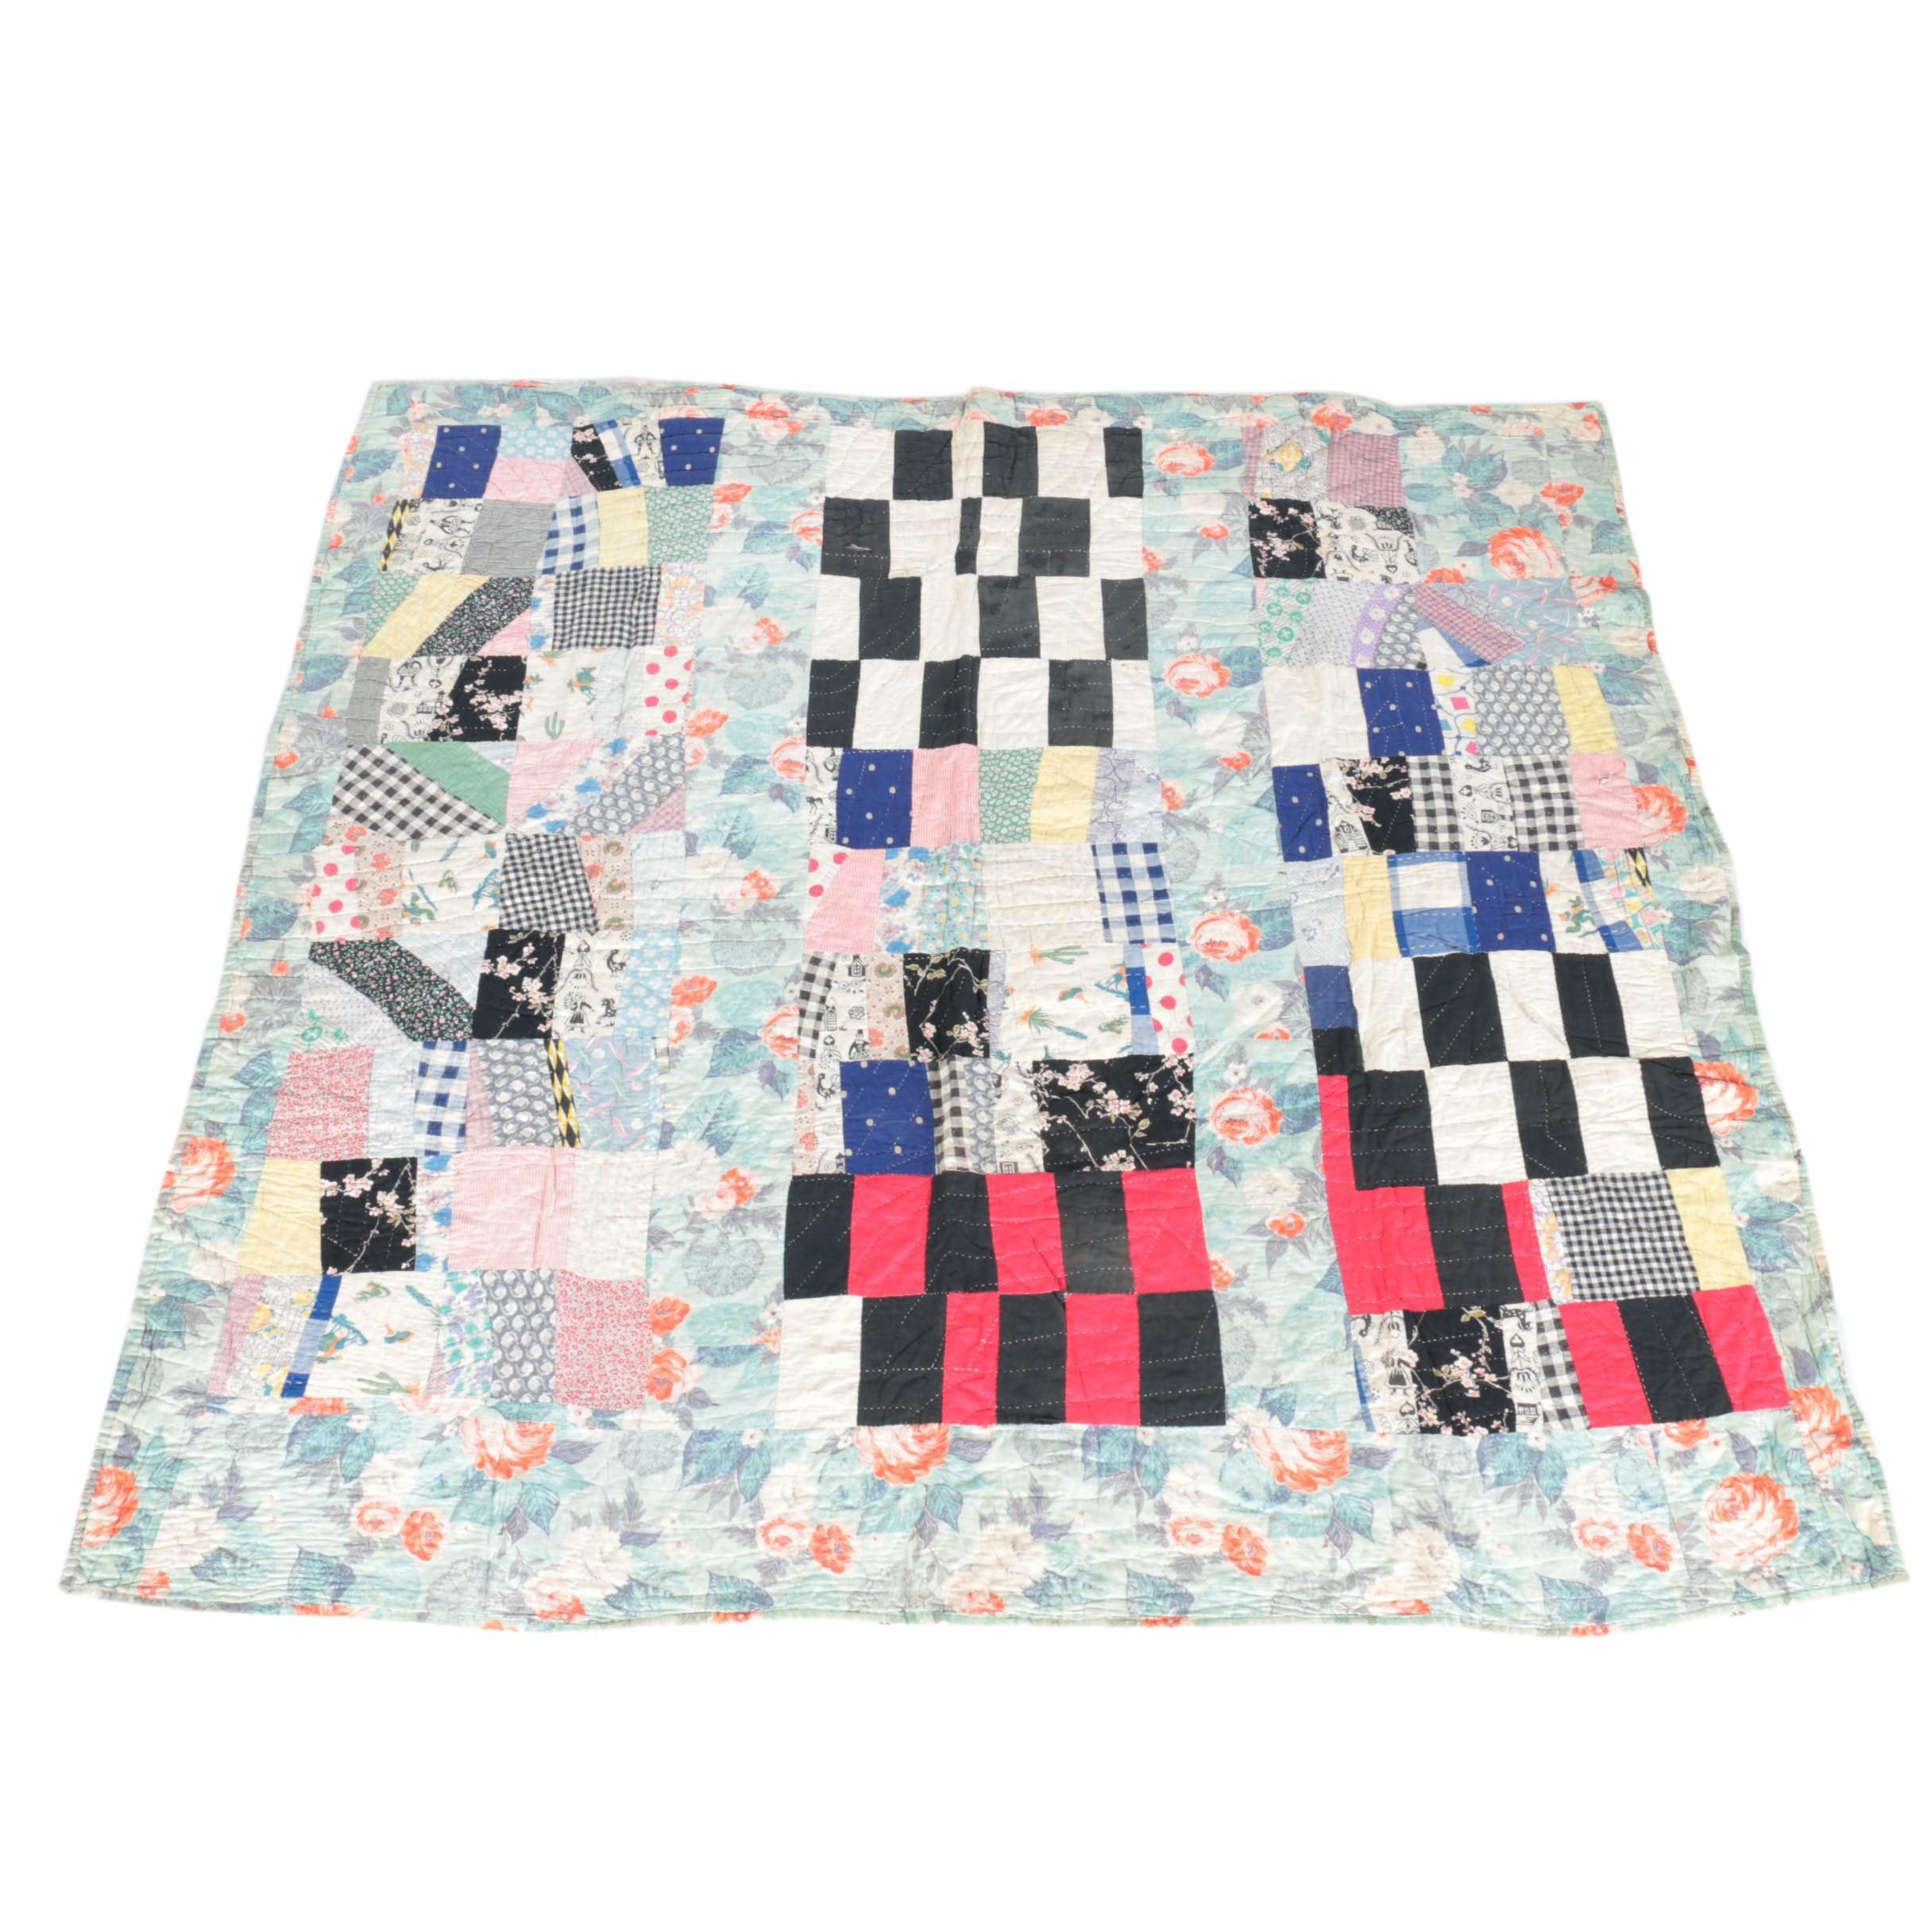 Floral Handmade Quilt